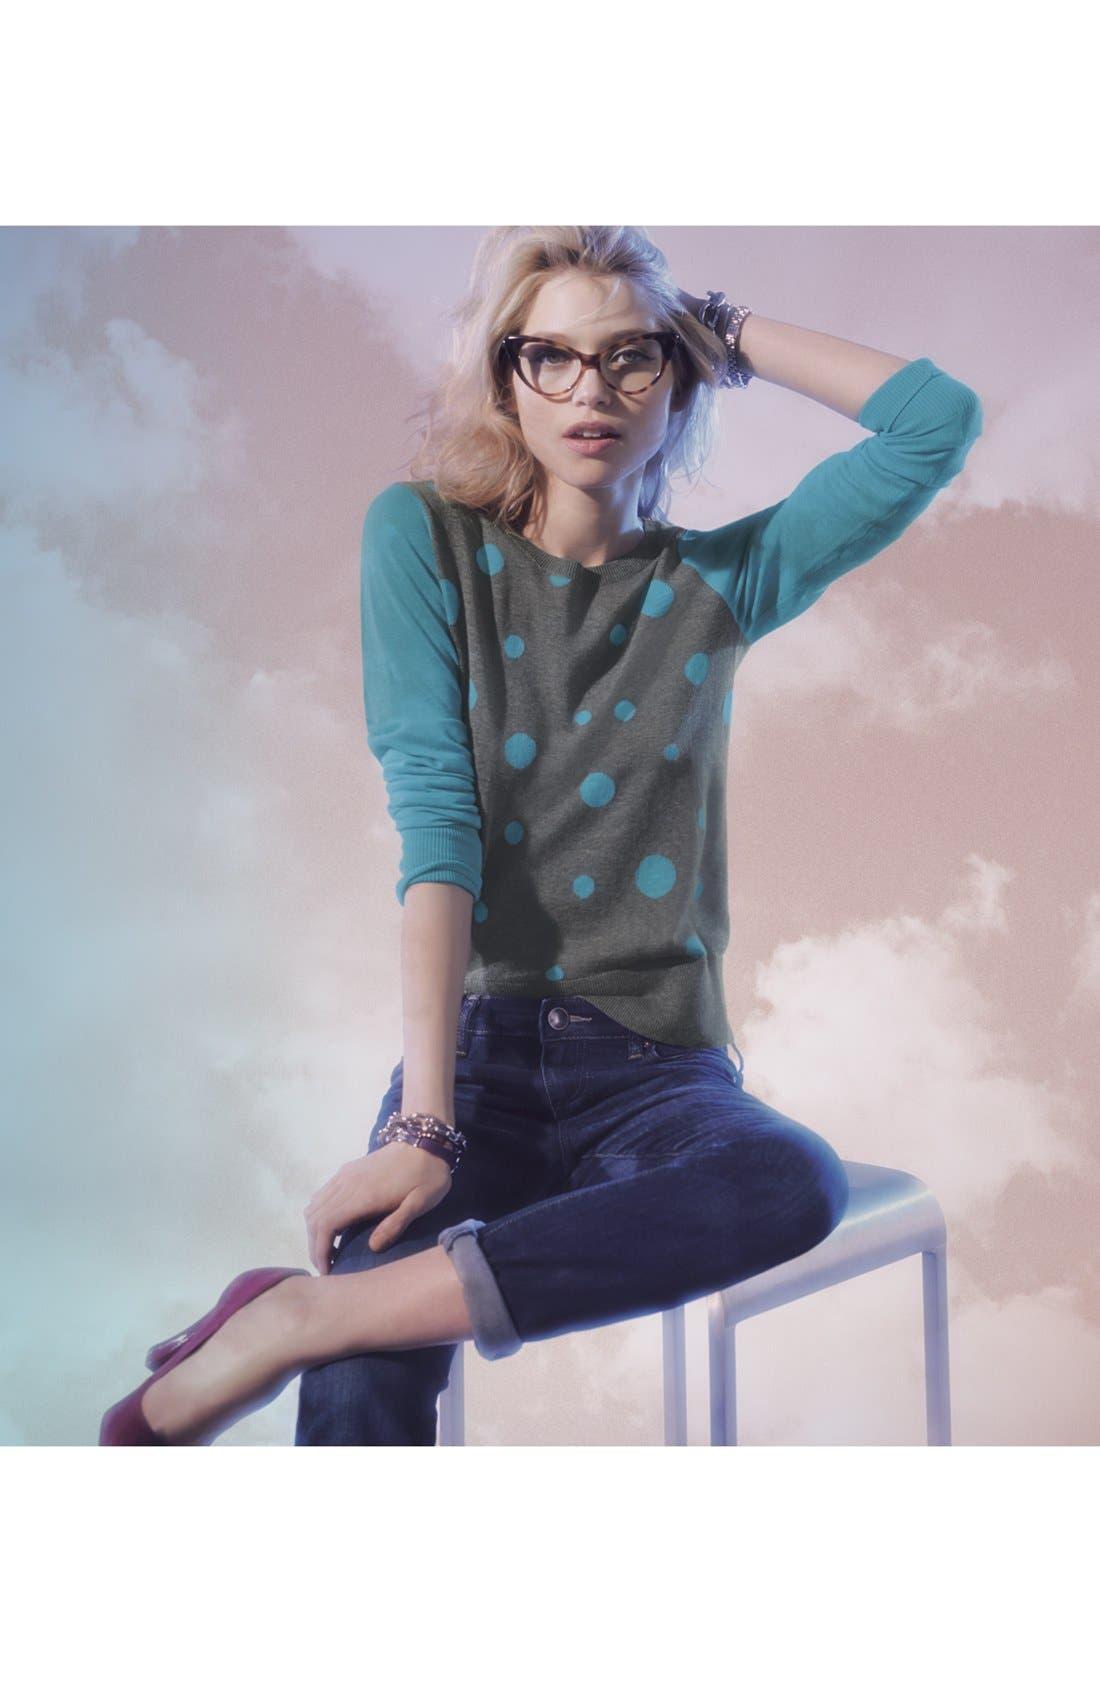 Alternate Image 1 Selected - Halogen® Sweater & KUT from the Kloth Boyfriend Jeans